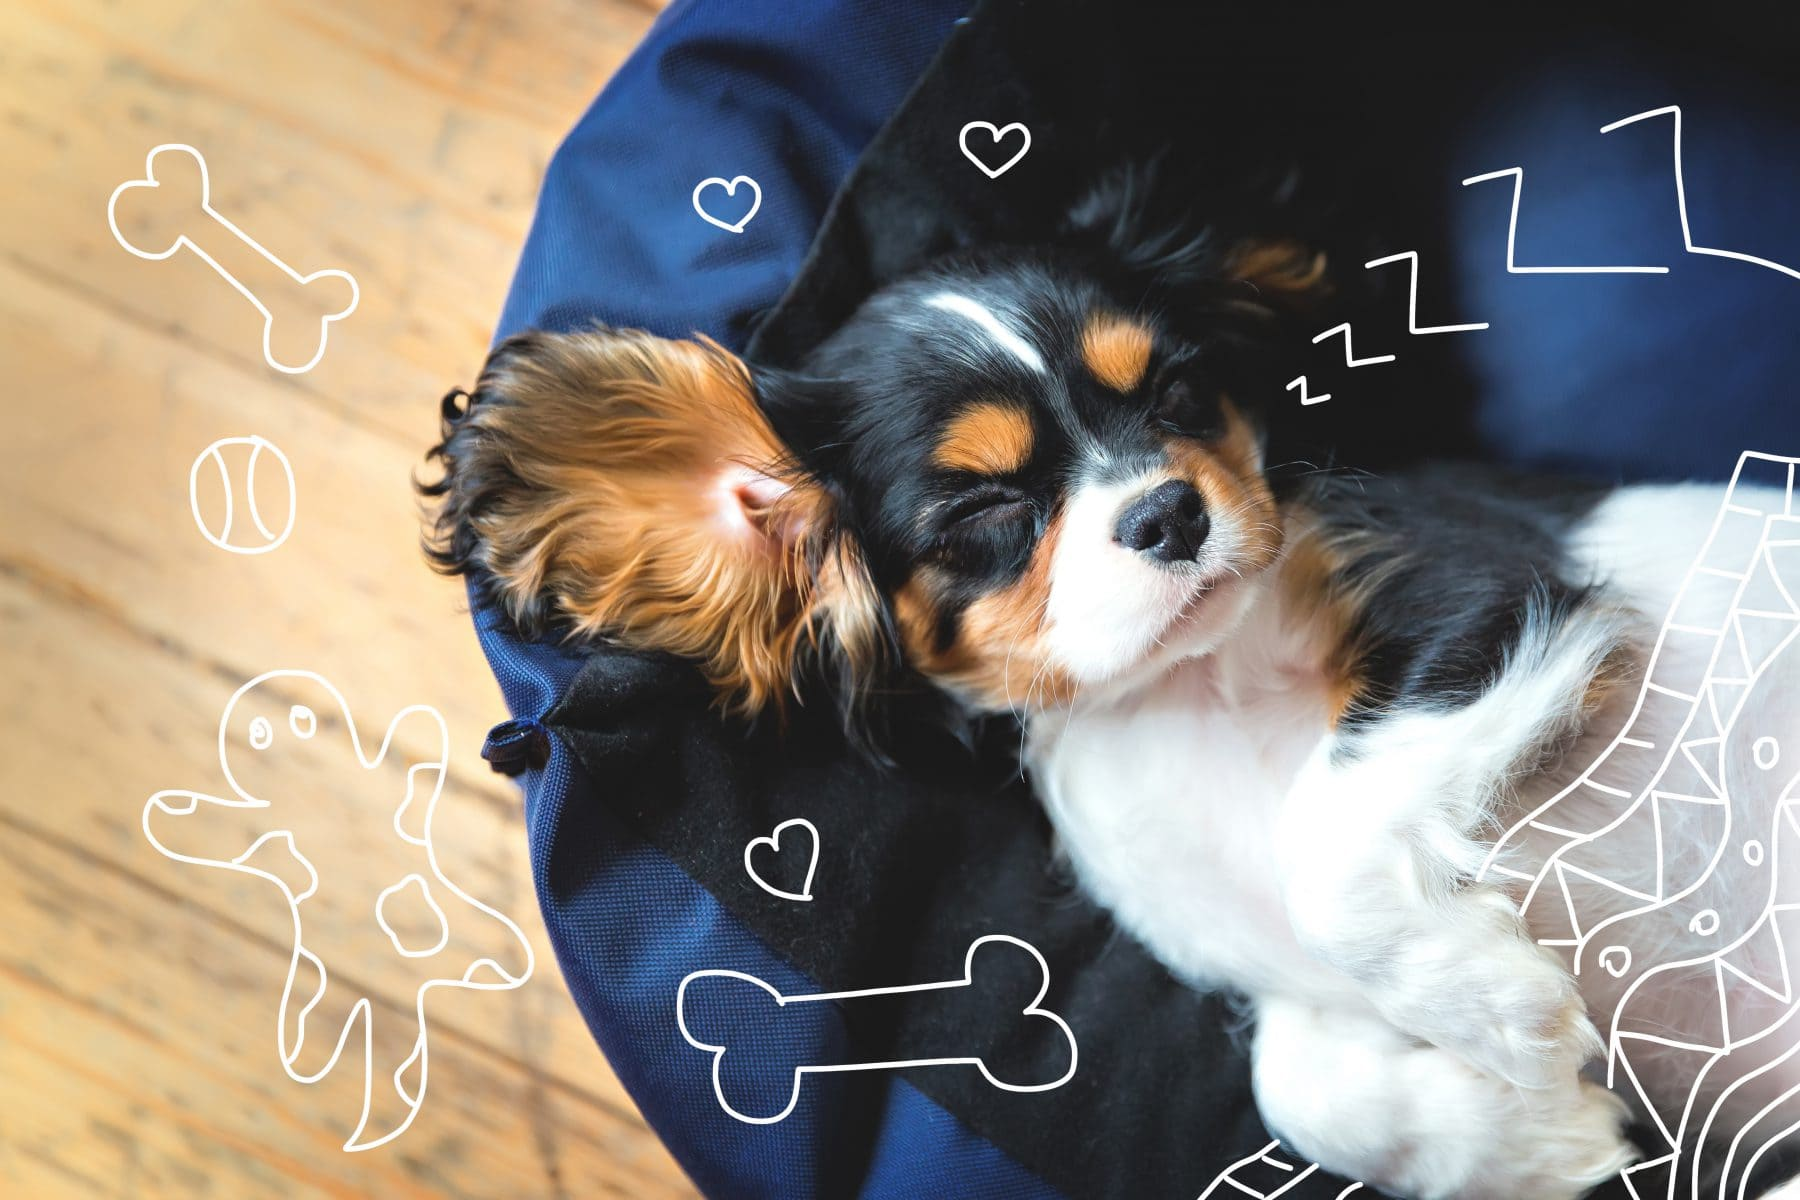 A puppy sleeps. Puppies sleeping through the night.